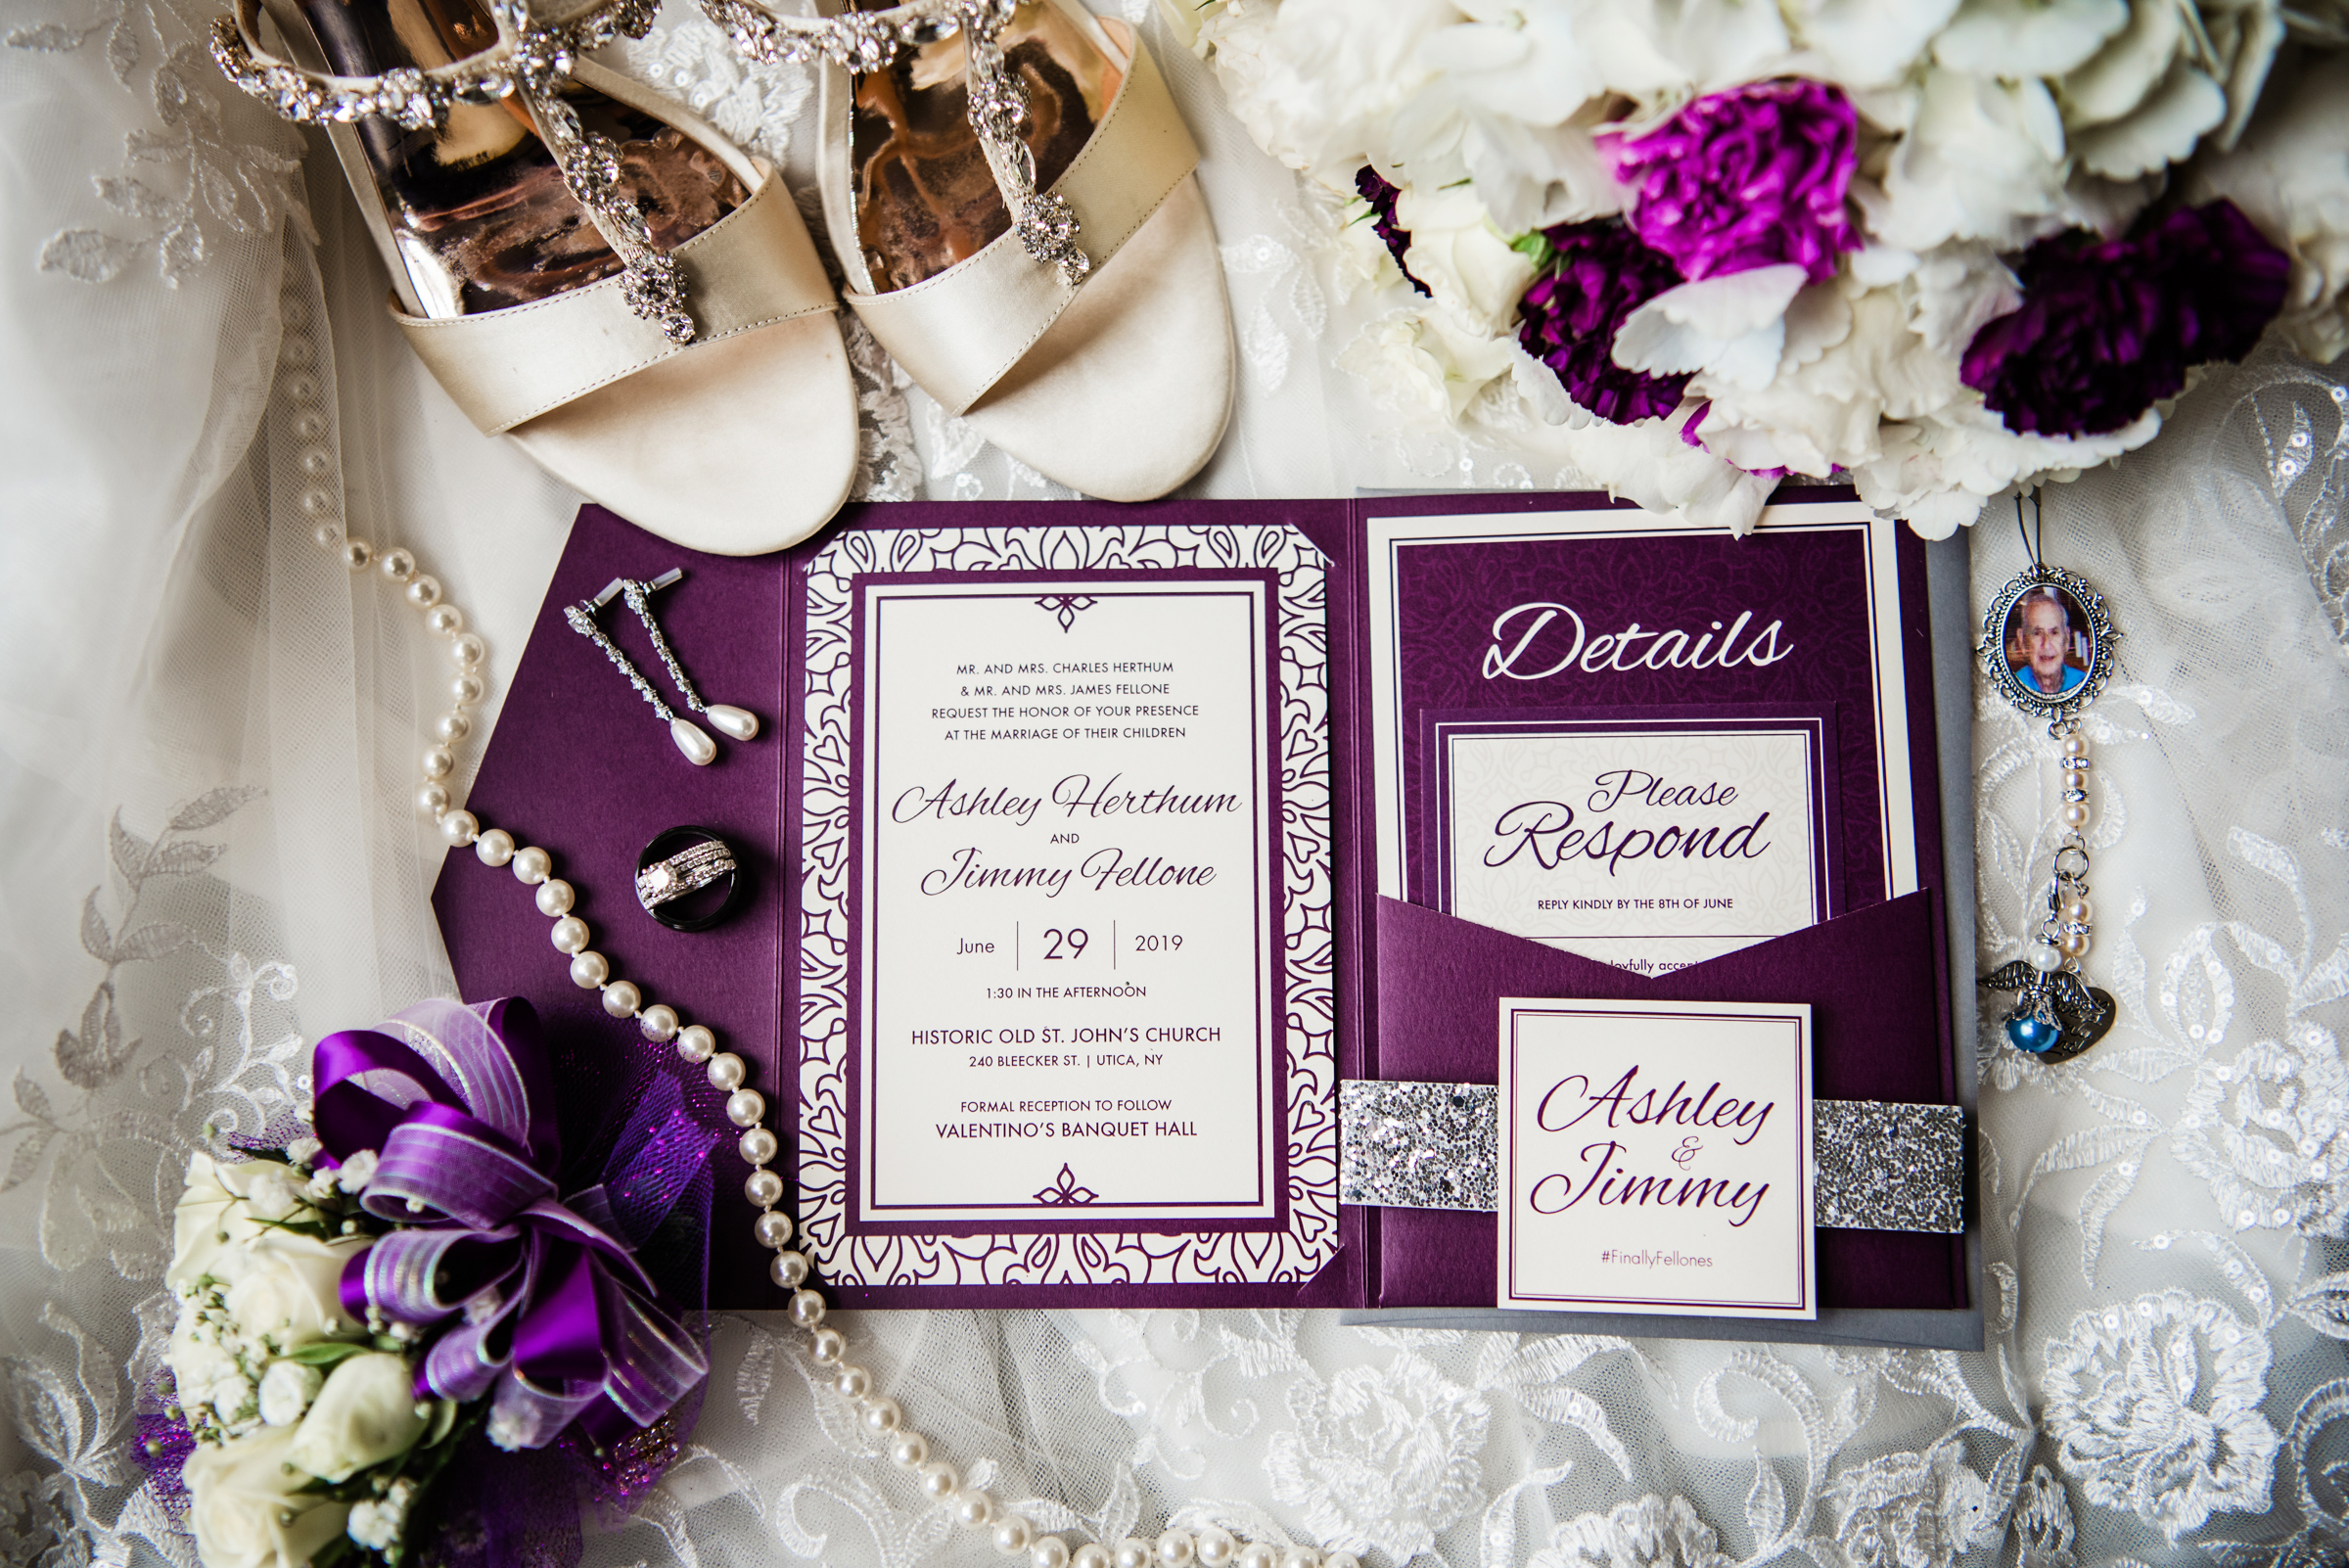 Historic_Old_St_Johns_Church_Valentinos_Banquet_Hall_Central_NY_Wedding_JILL_STUDIO_Rochester_NY_Photographer_DSC_5367.jpg